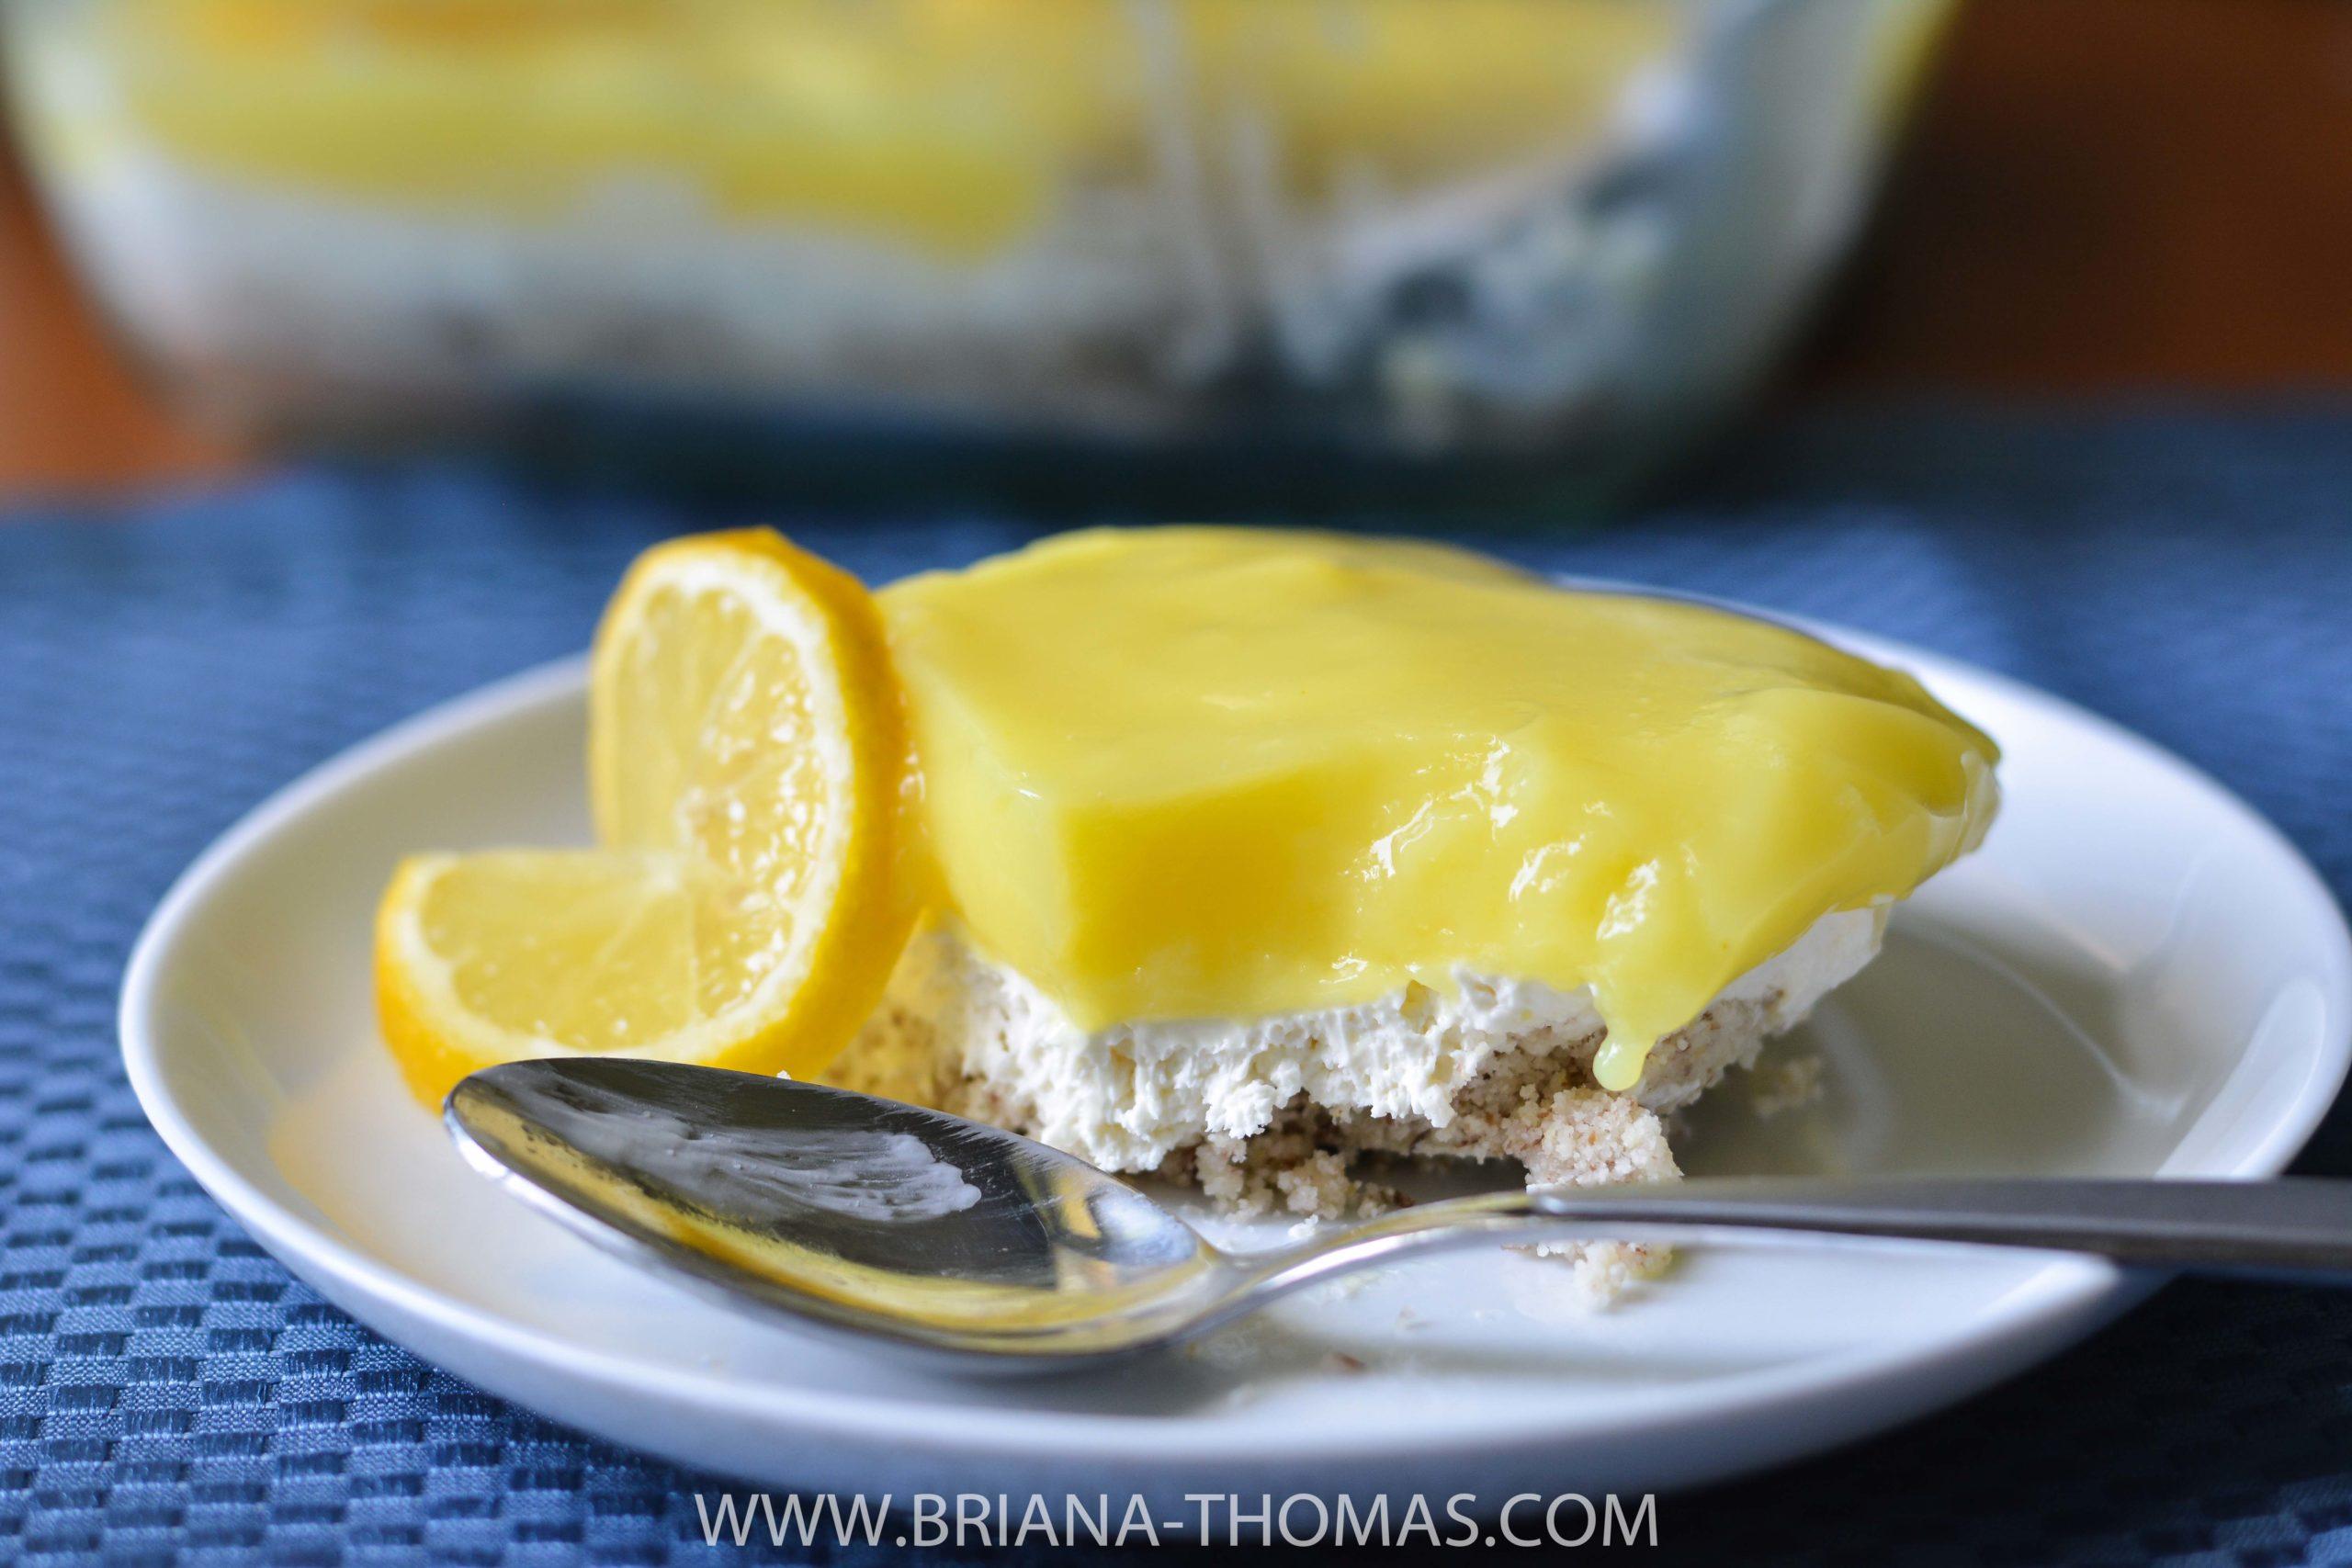 Lemon Cheesecake Delight - Briana Thomas